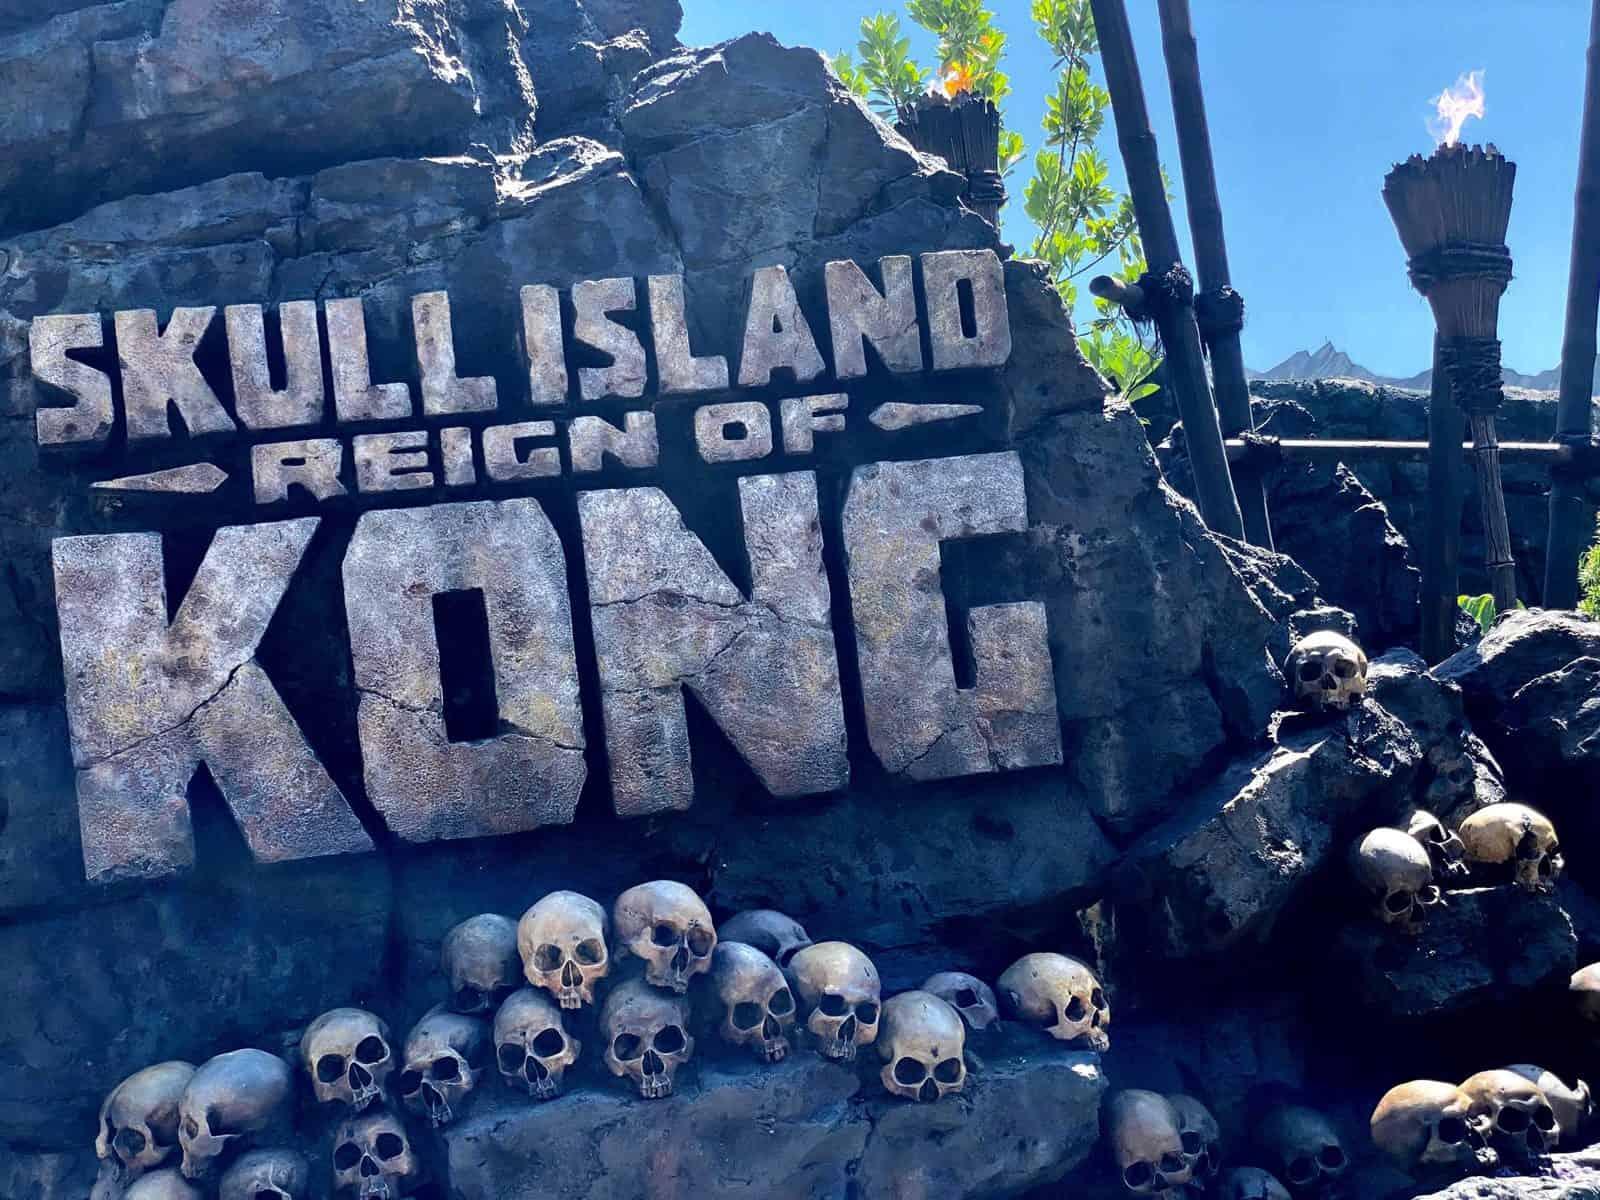 skull island reign of kong